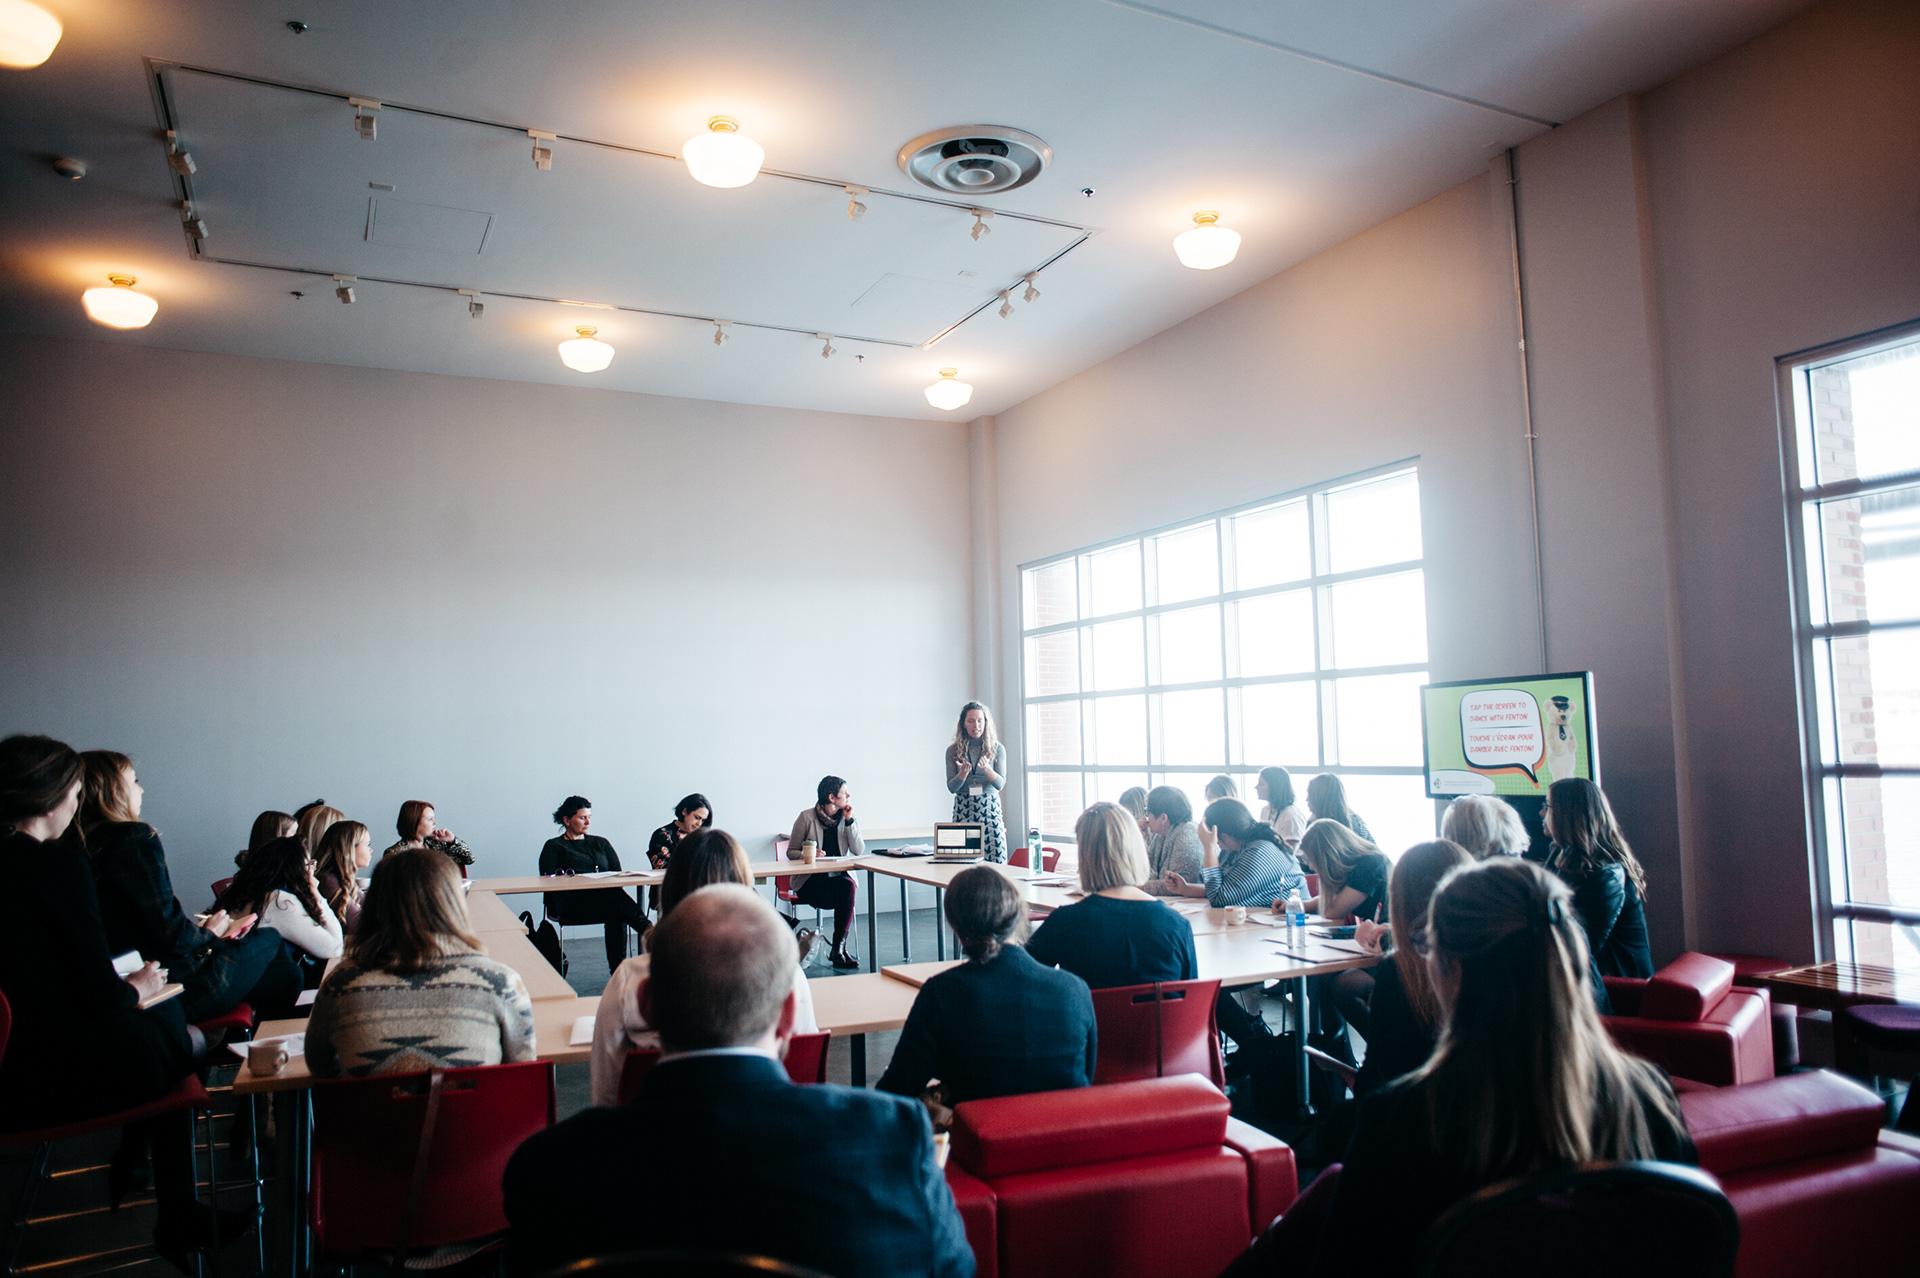 Forum 2019 in Halifax [photo credits: Haley Anne McPhee]